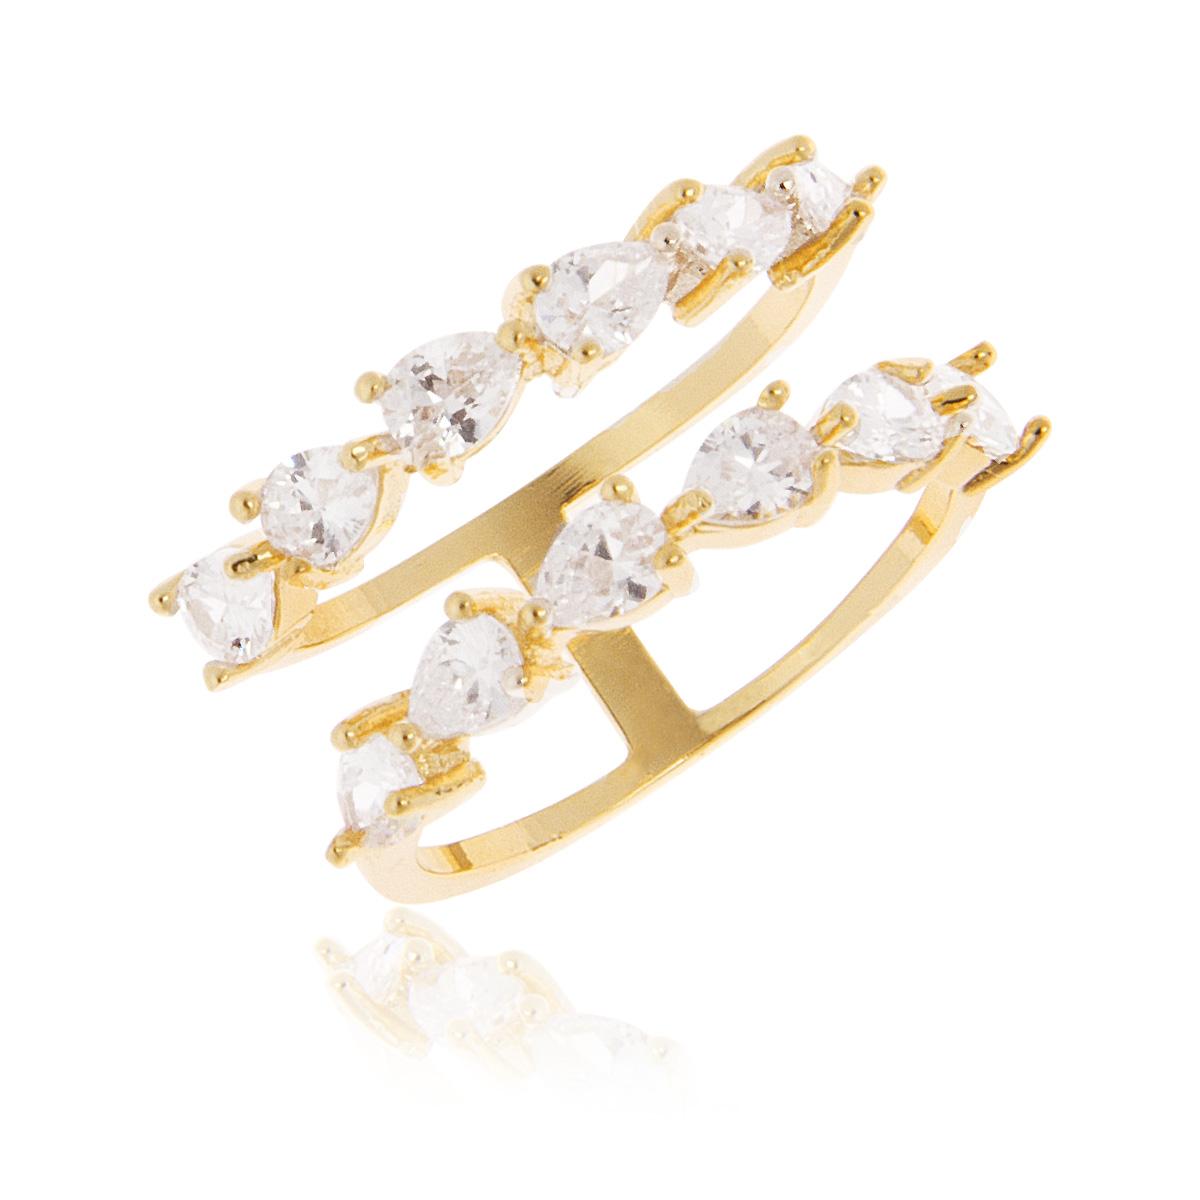 Anel Aro Duplo de Zircônia Branca Semijoia em Ouro 18K  - Soloyou